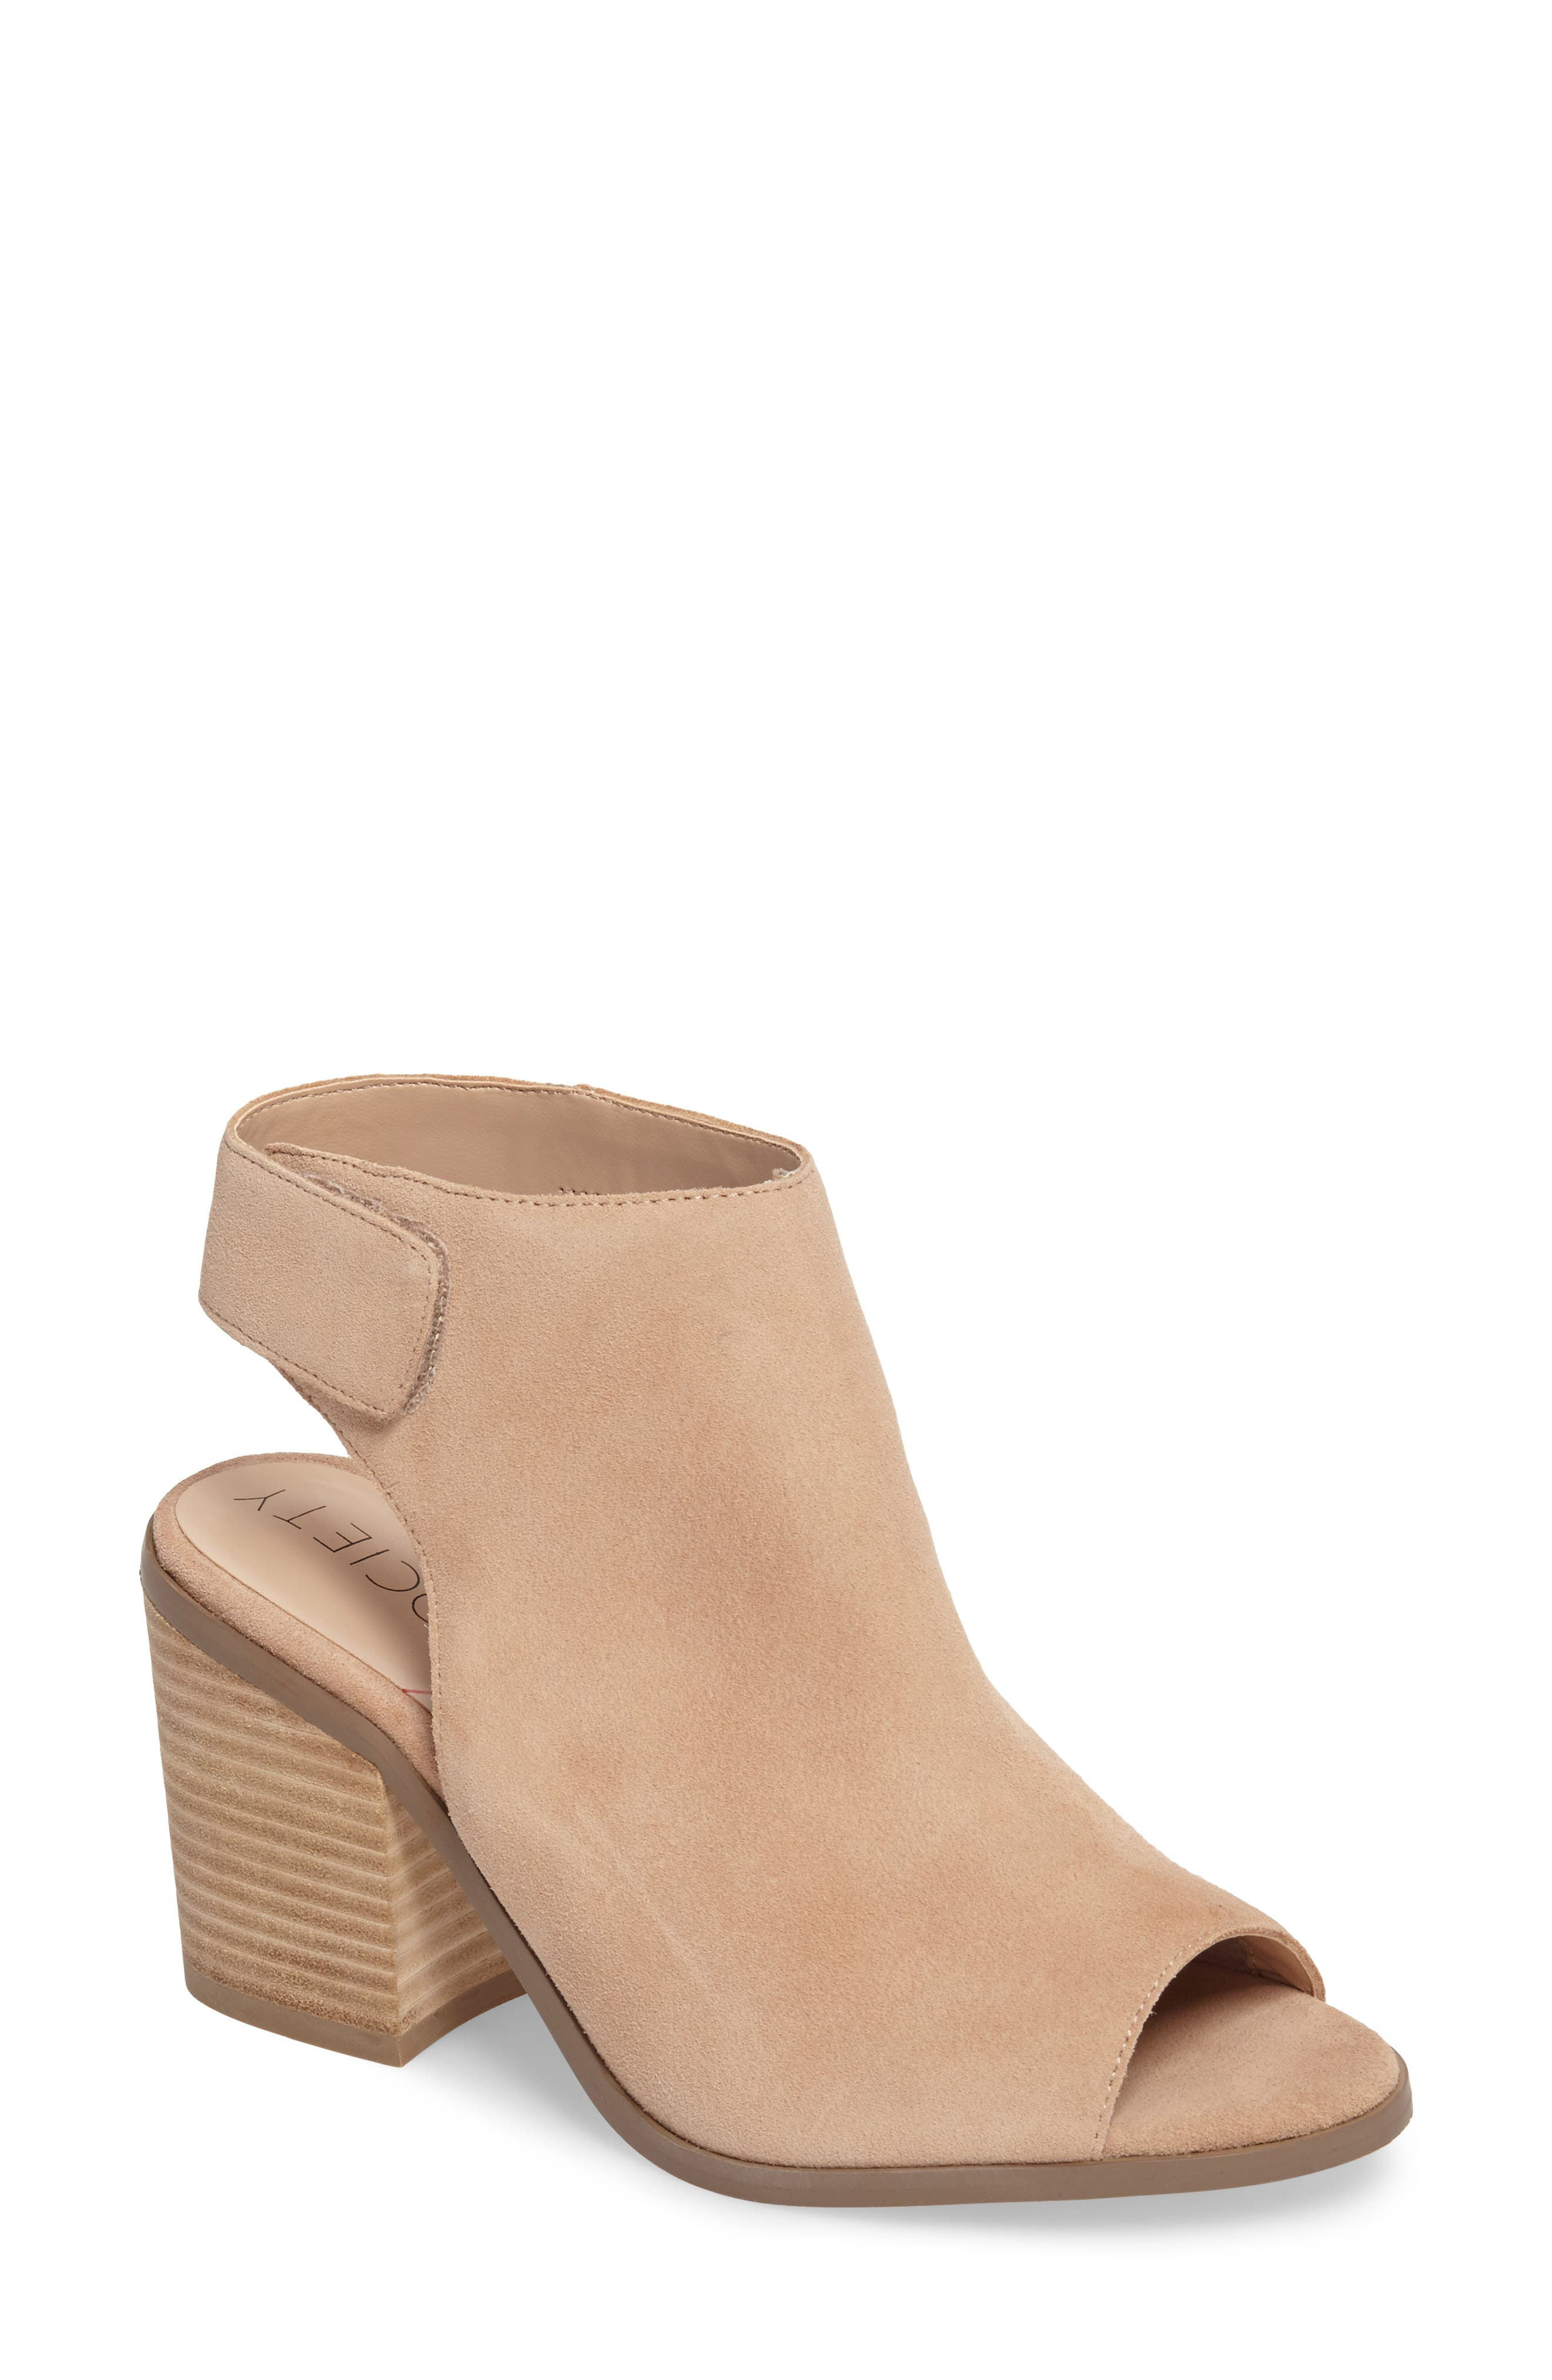 Peep Toe Sandal,                         Main,                         color, 209